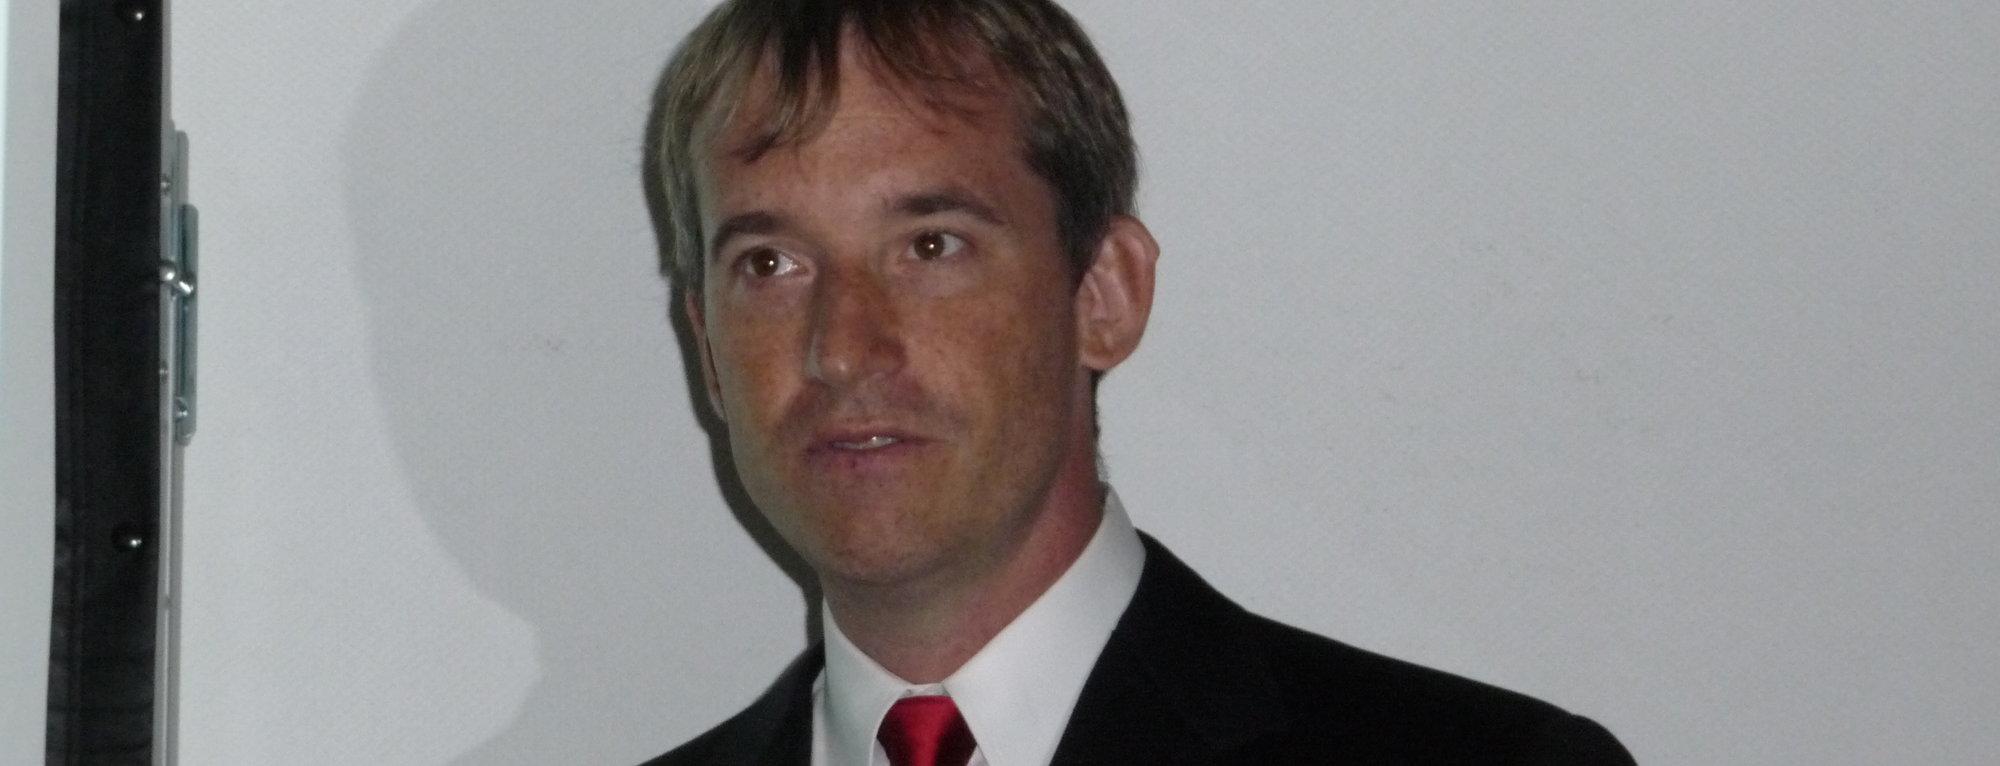 Colin Angle leder selskapet iRobot, som både leverer krigsroboter og automatiske støvsugere.